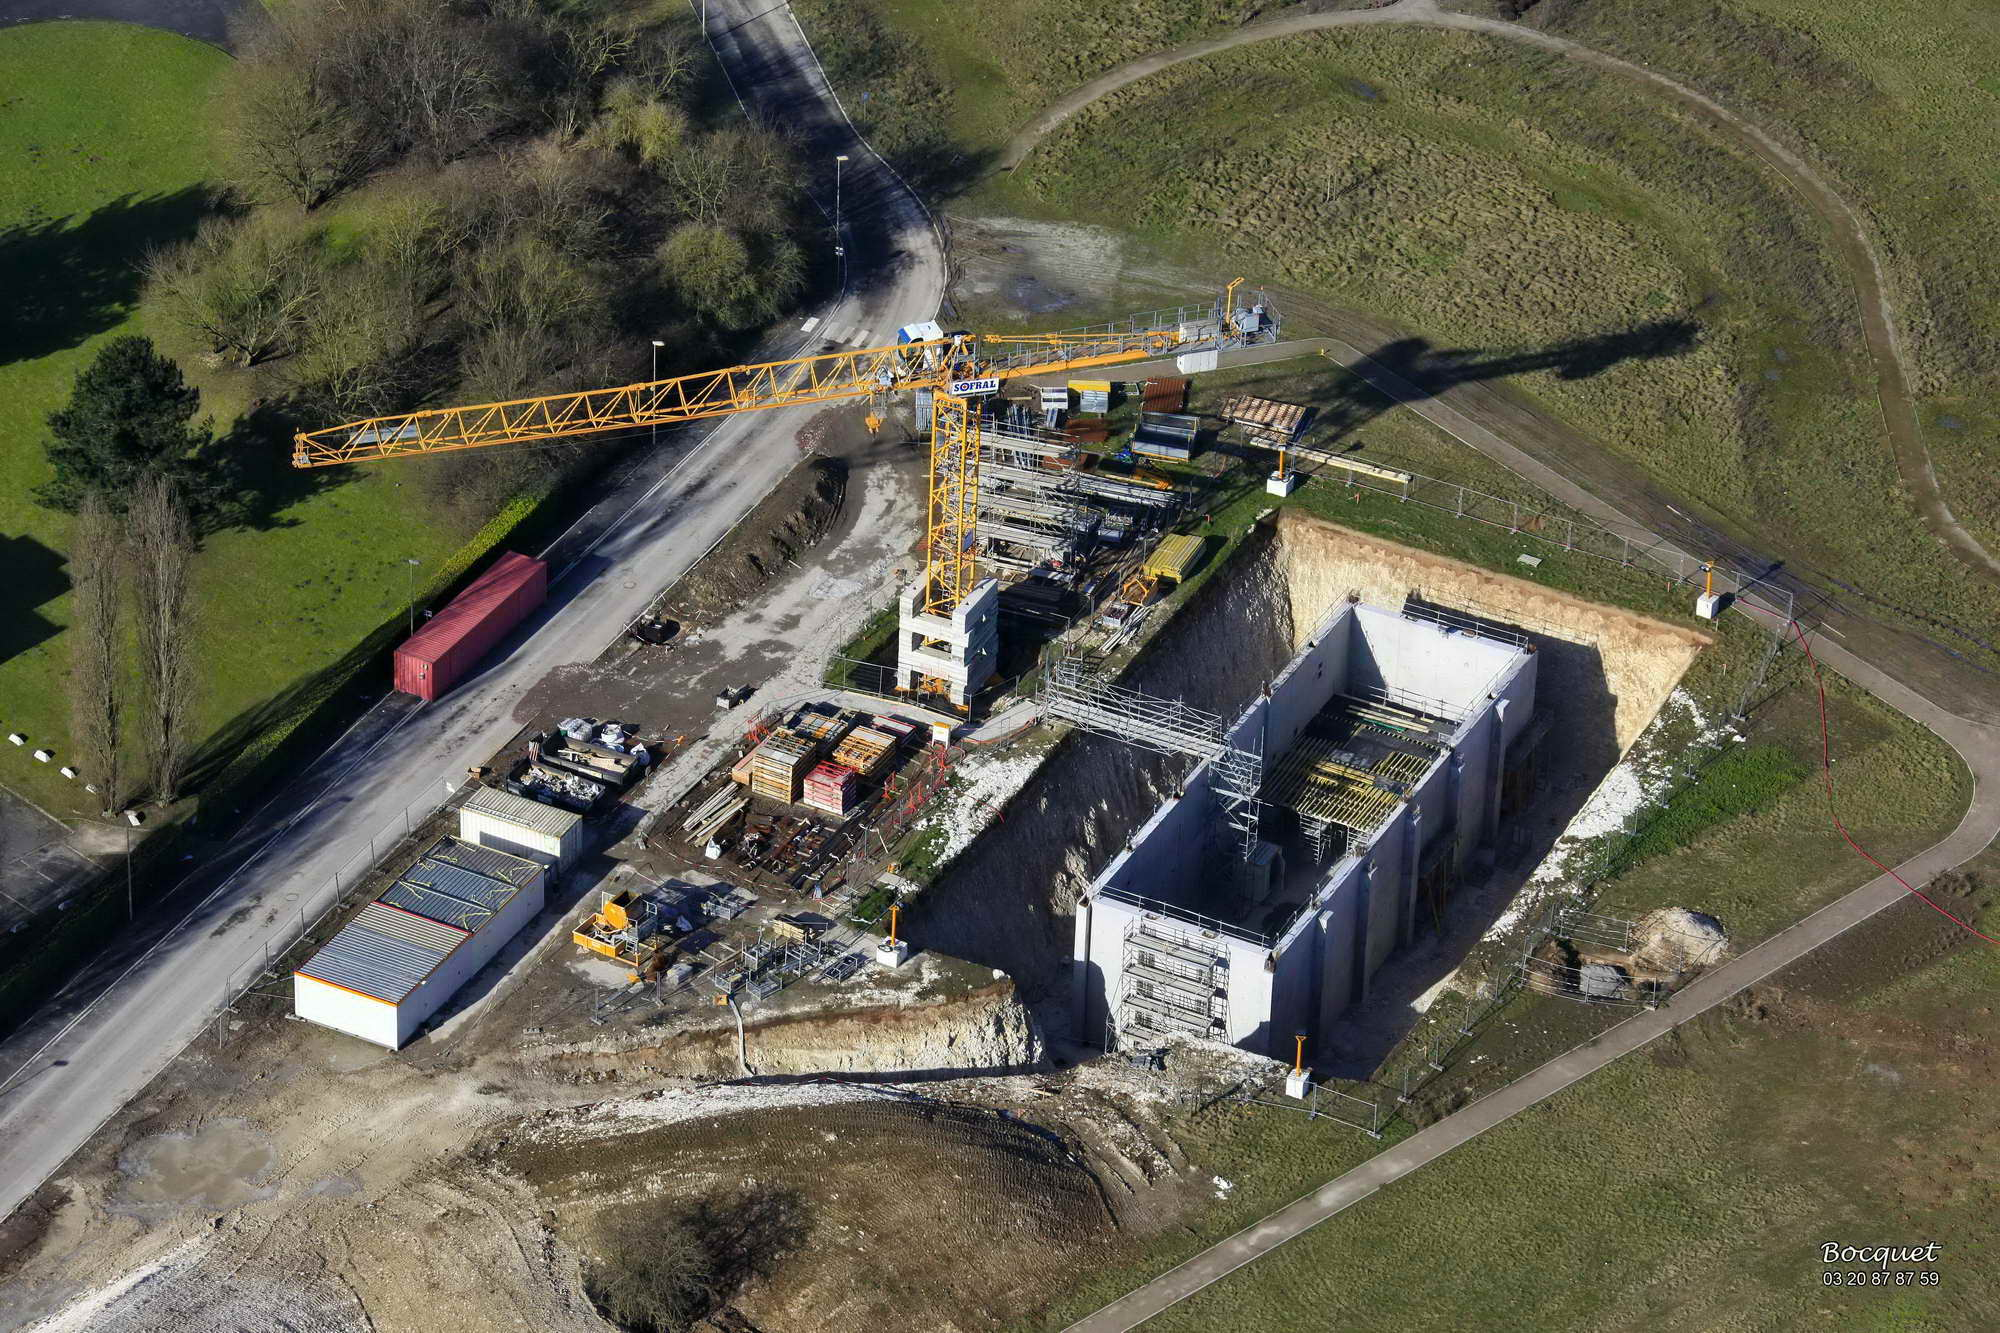 Le chantier WEEMBI : terrassement, ferraillage, fondations, cuve beton